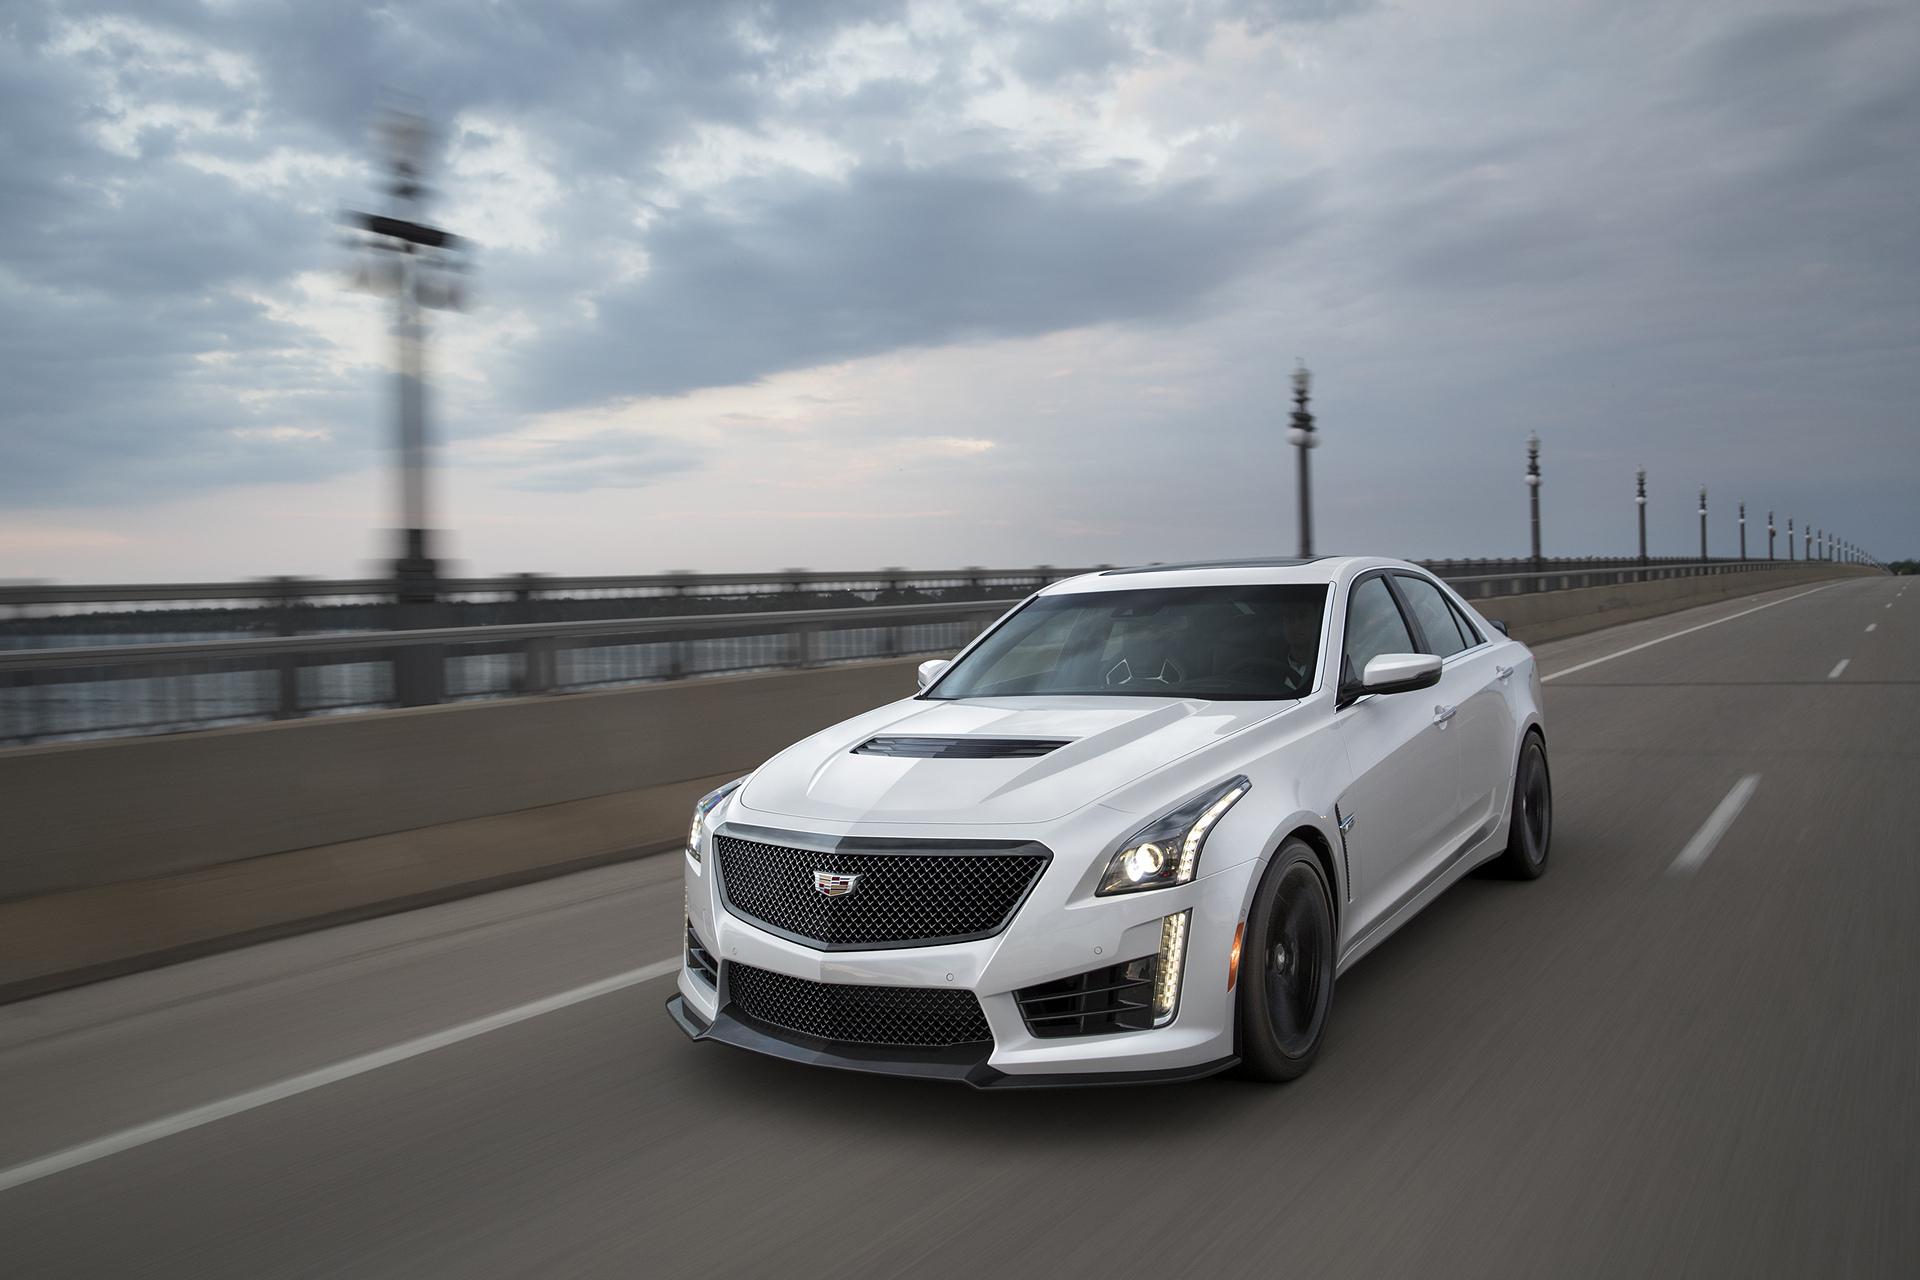 2017 Cadillac CTS-V © General Motors